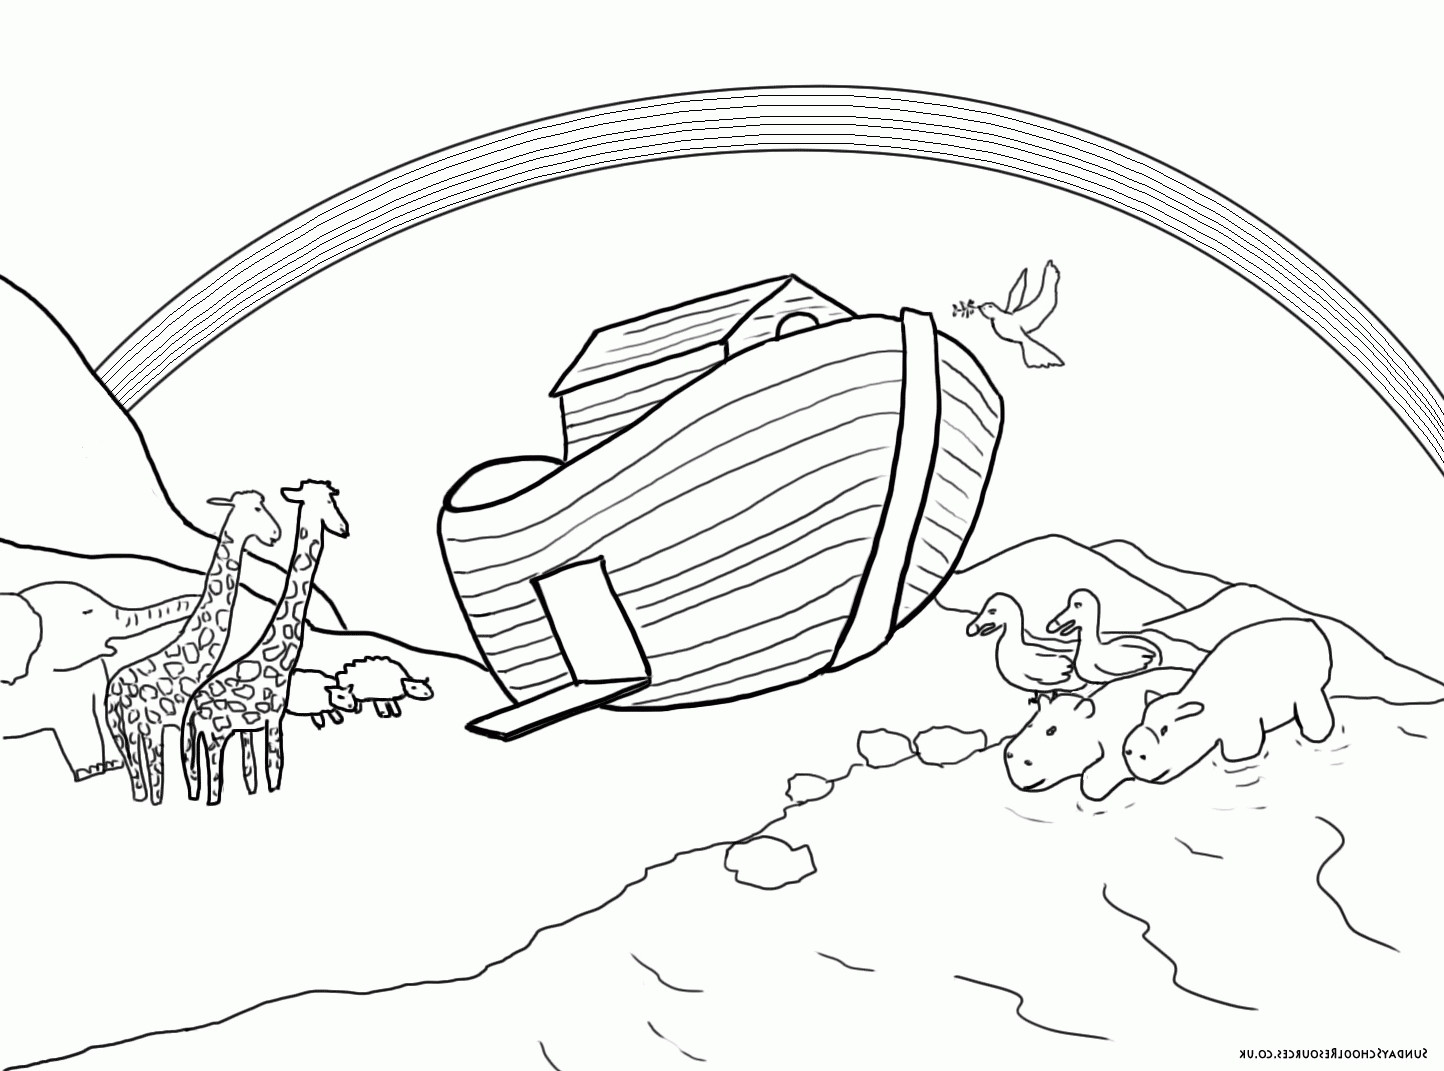 Best ideas about Noah'S Ark Free Coloring Pages . Save or Pin Noah s Ark Coloring Page NAXK Obsession Noahs Ark Coloring Now.